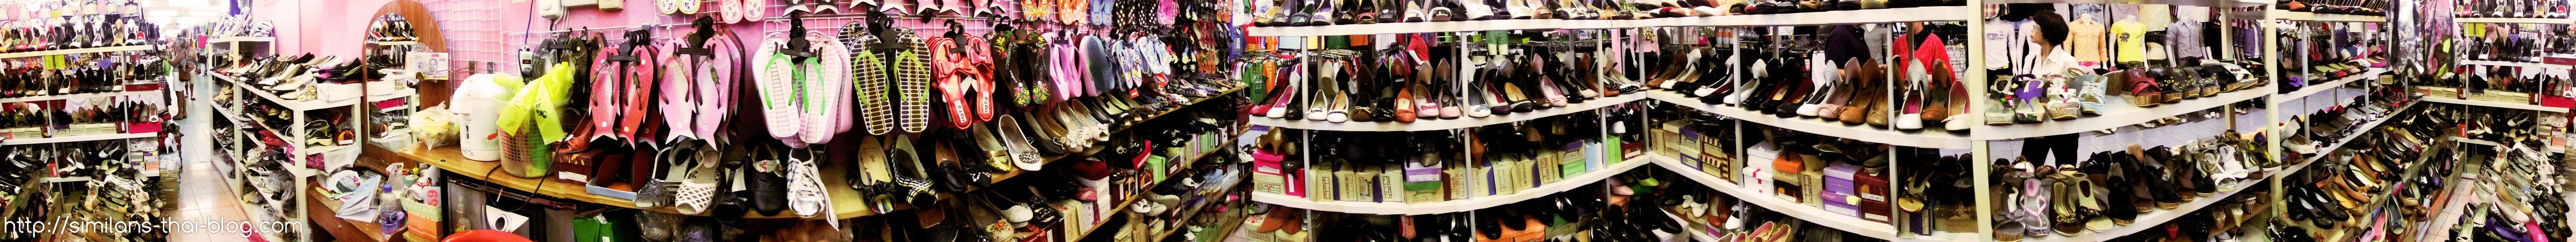 shoe-shopping-expo-plaza-panorama